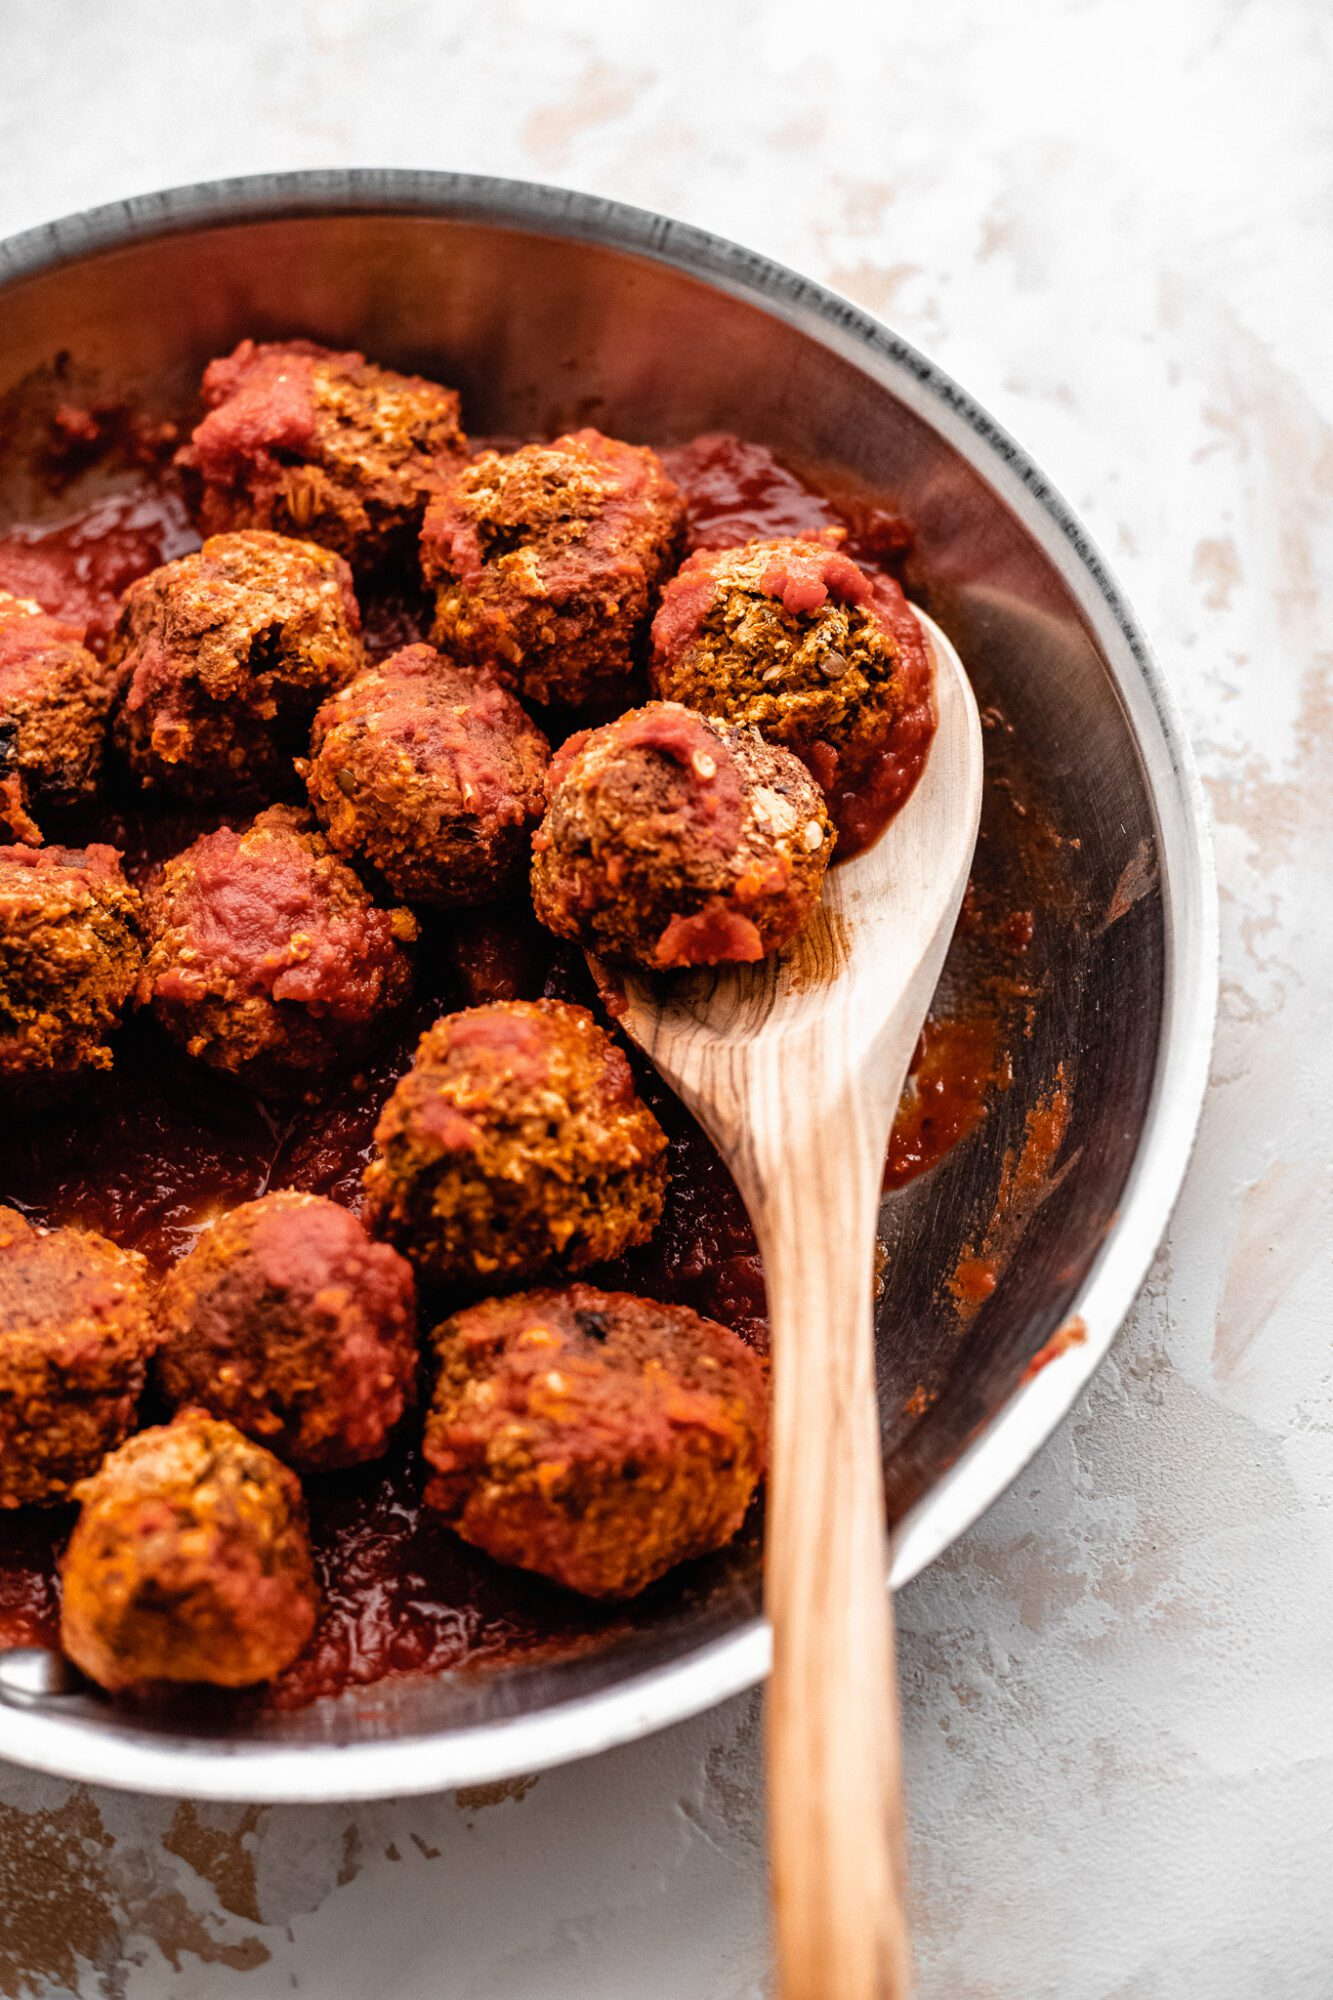 sauce pan with gluten free vegan meatballs